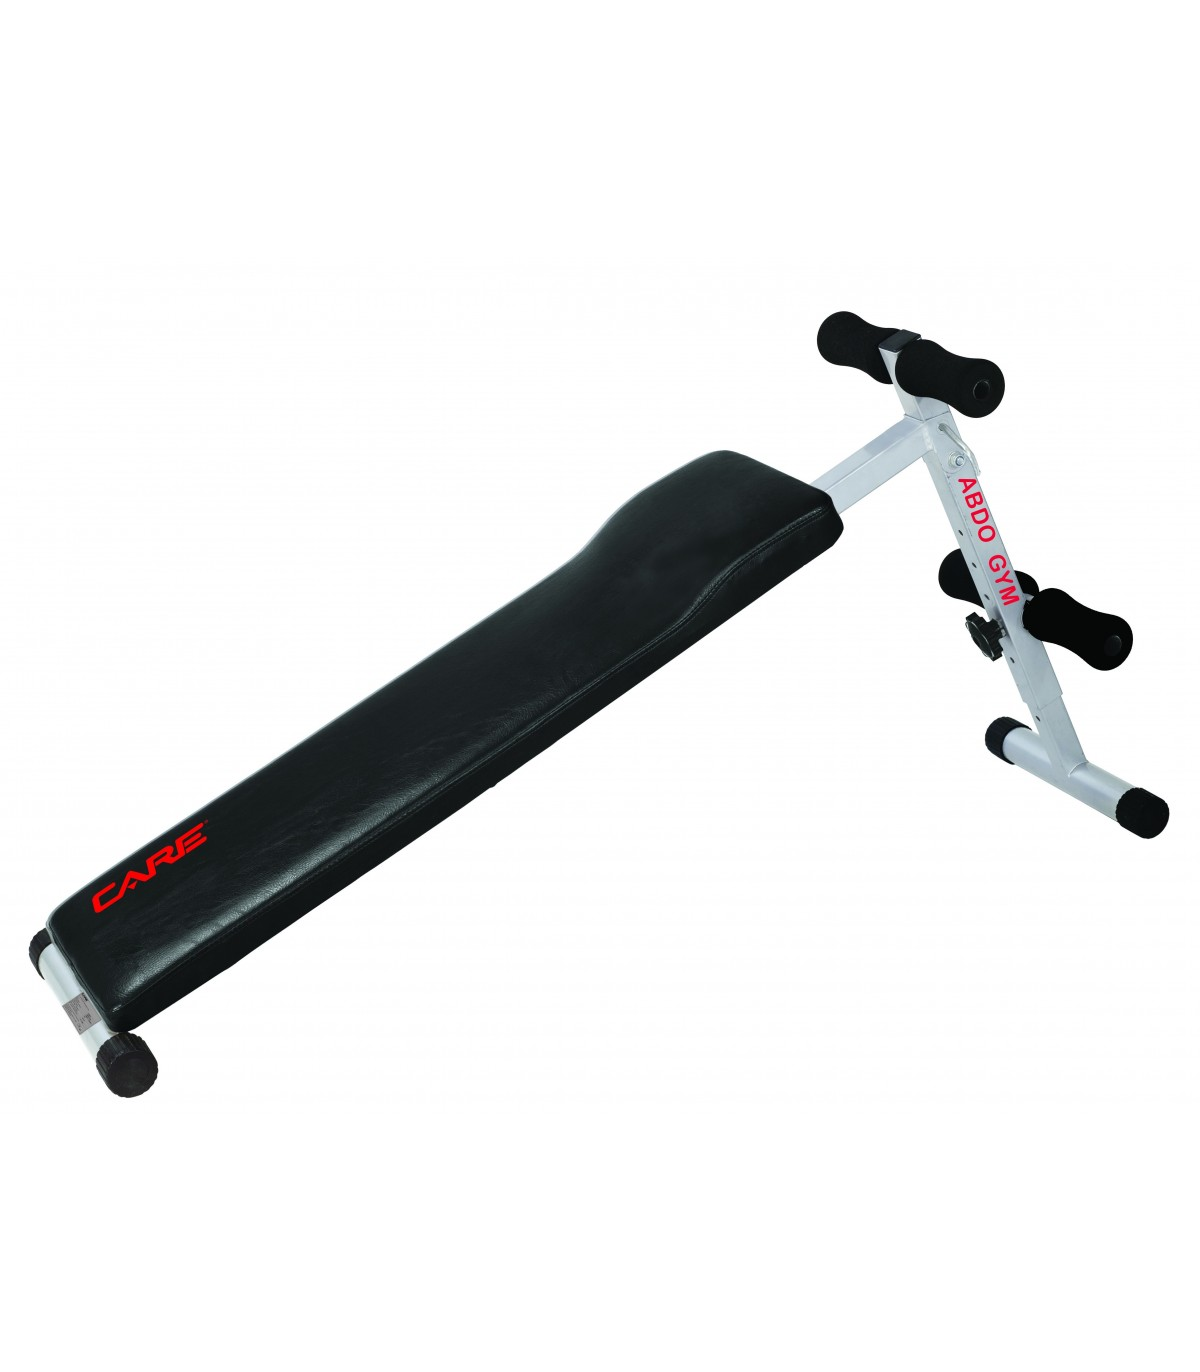 planche abdominale abdo gym ii care fitness. Black Bedroom Furniture Sets. Home Design Ideas